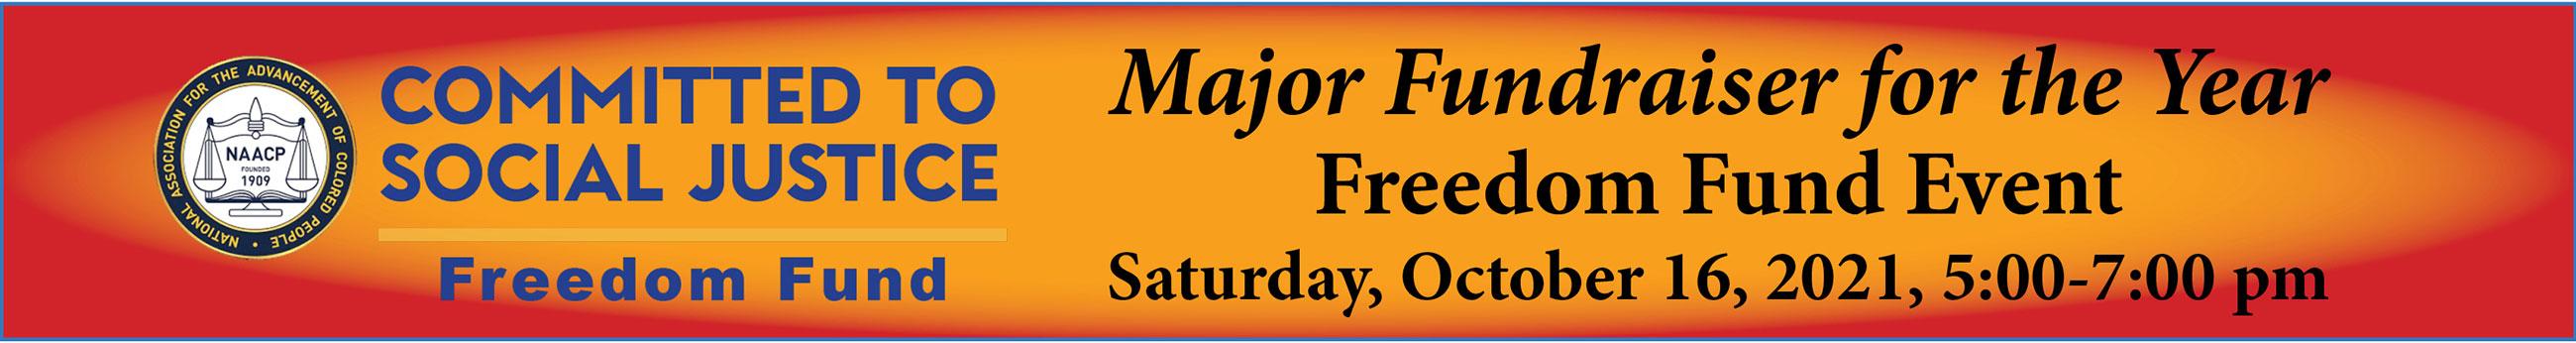 Freedom Fund Event